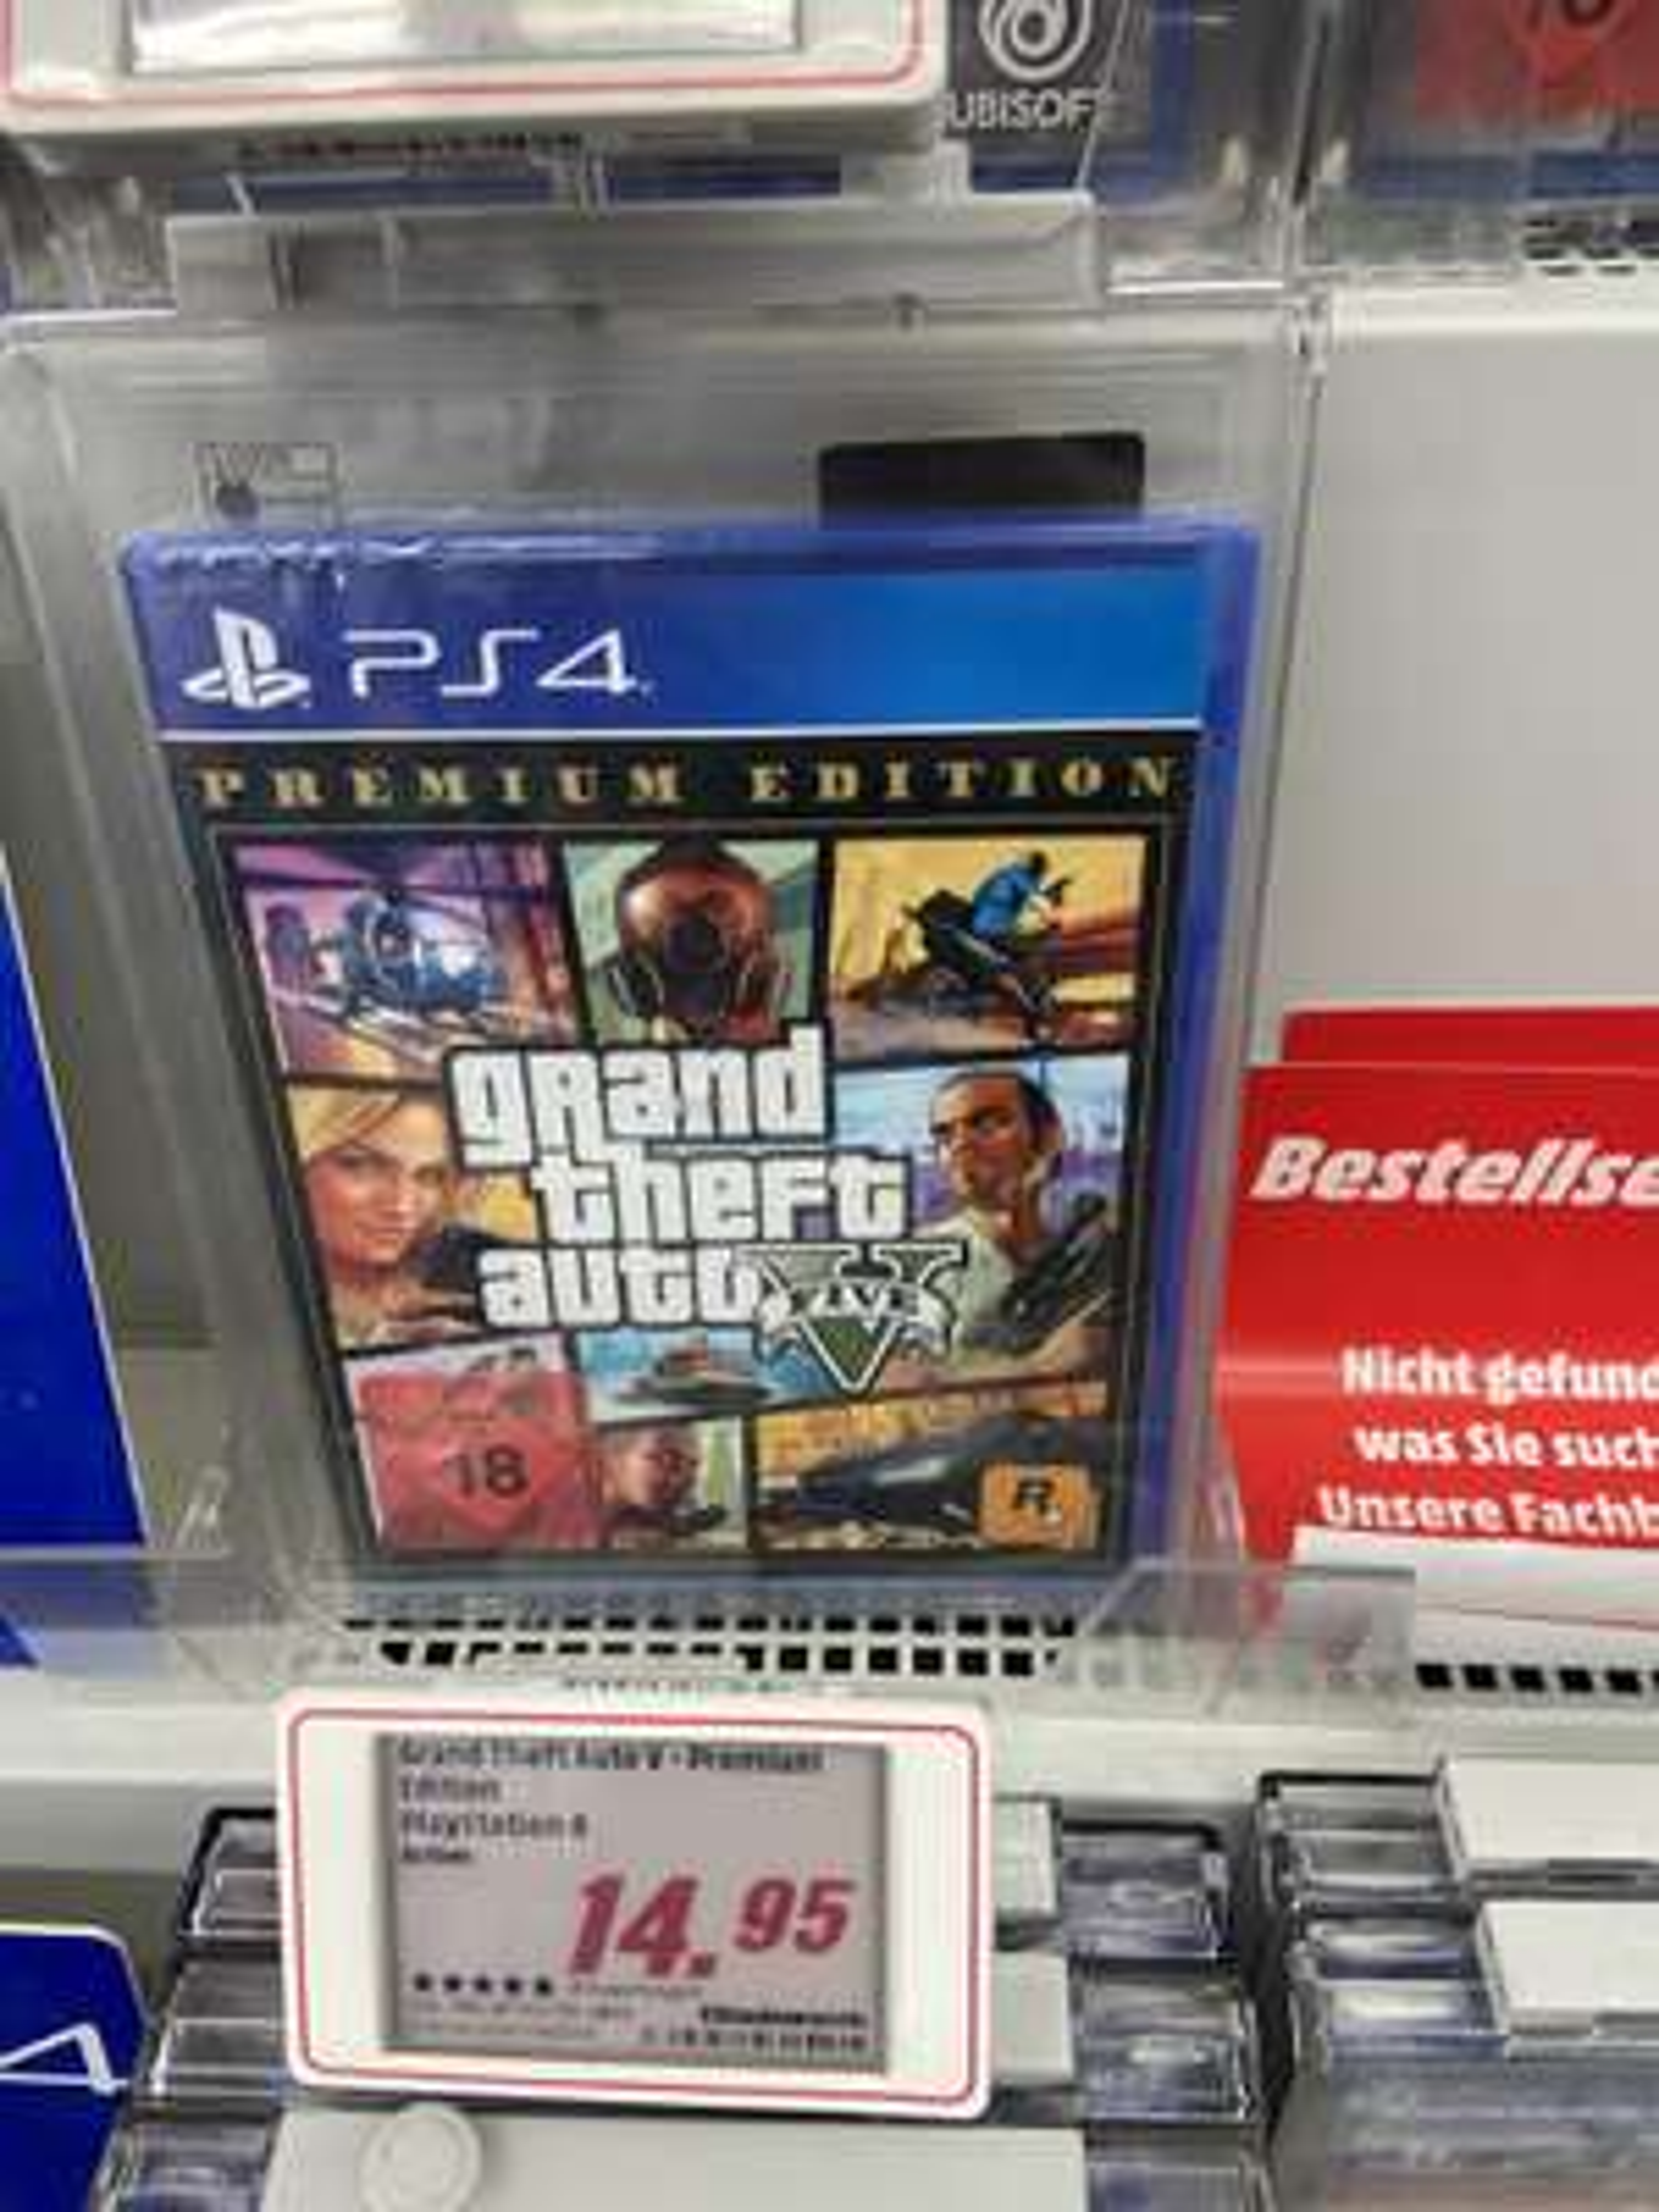 Grand theft auto 5 (GTA 5) Premium Edition PS4 (MediaMarkt Bonn Zentrum)